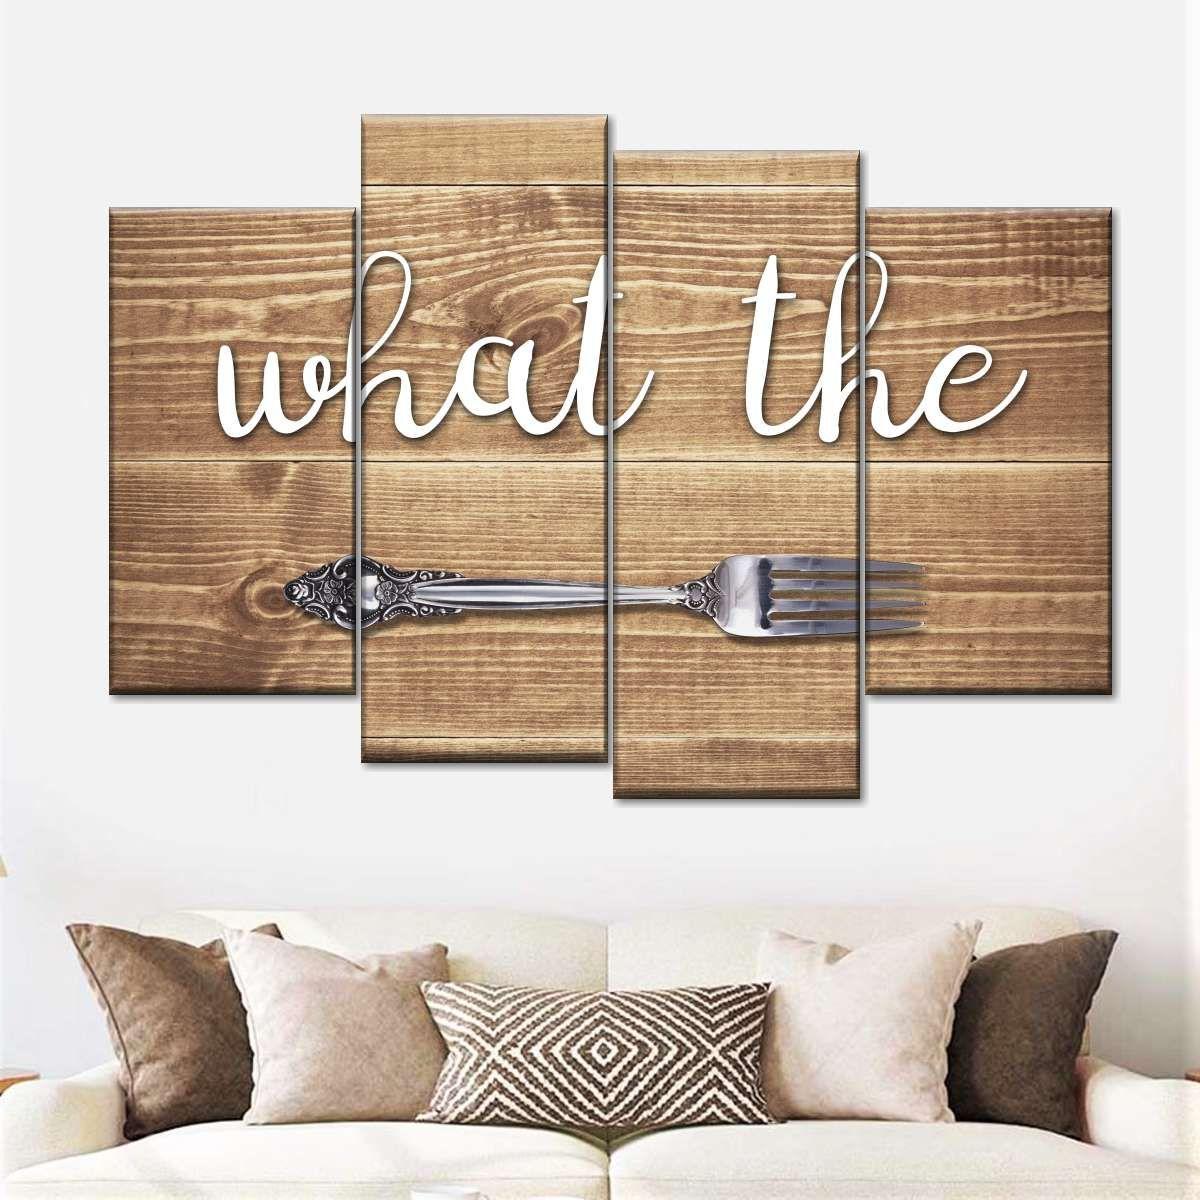 What The Fork Multi Panel Canvas Wall Art In 2020 Kitchen Decor Wall Art Wood Wall Art Diy Modern Wall Decor Art